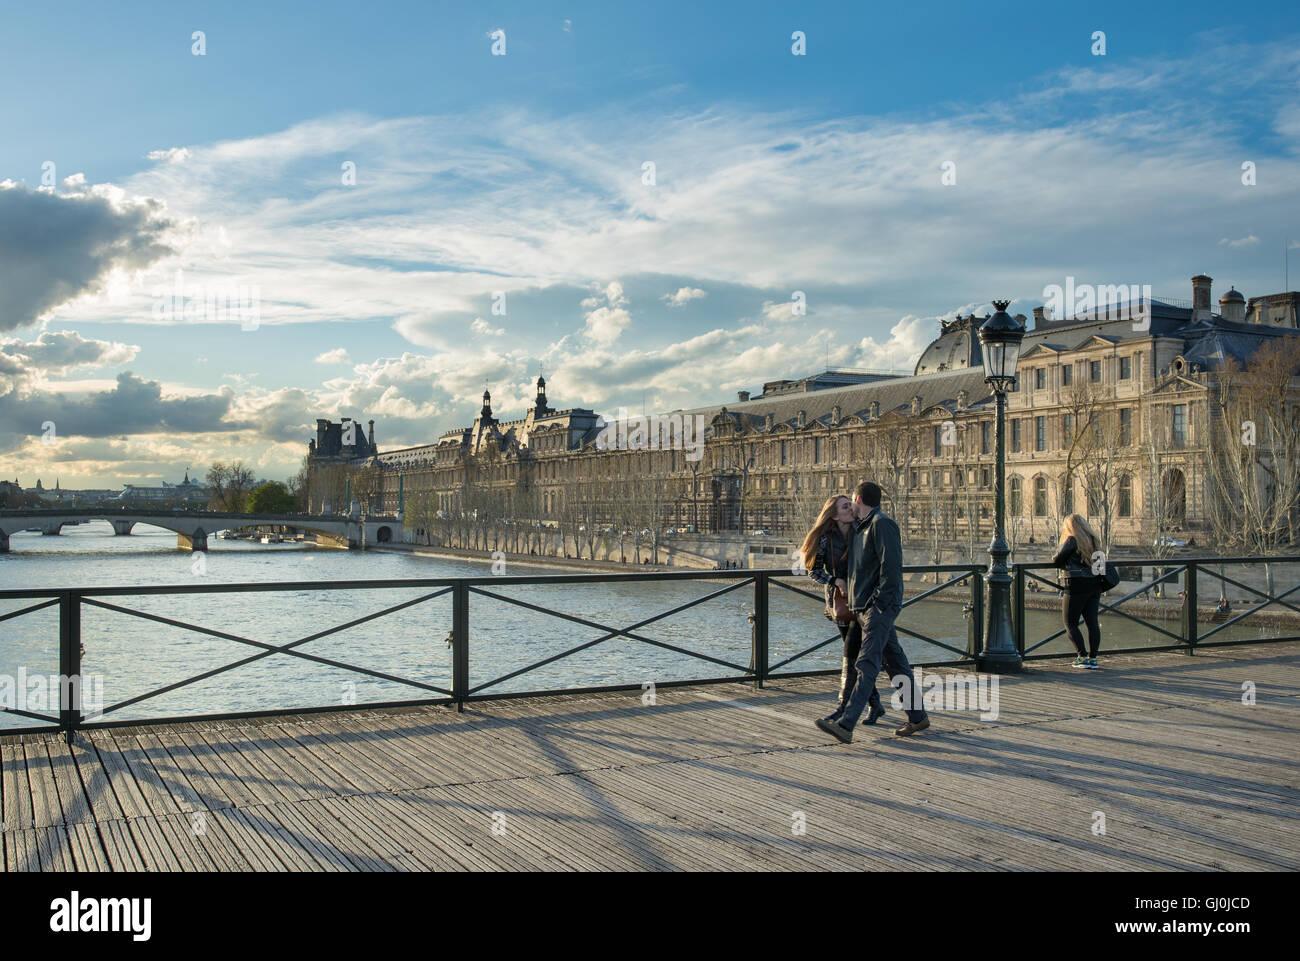 a couple kissing on the Pont des Arts over the River Seine with the Palais du Louvre, Paris, France - Stock Image